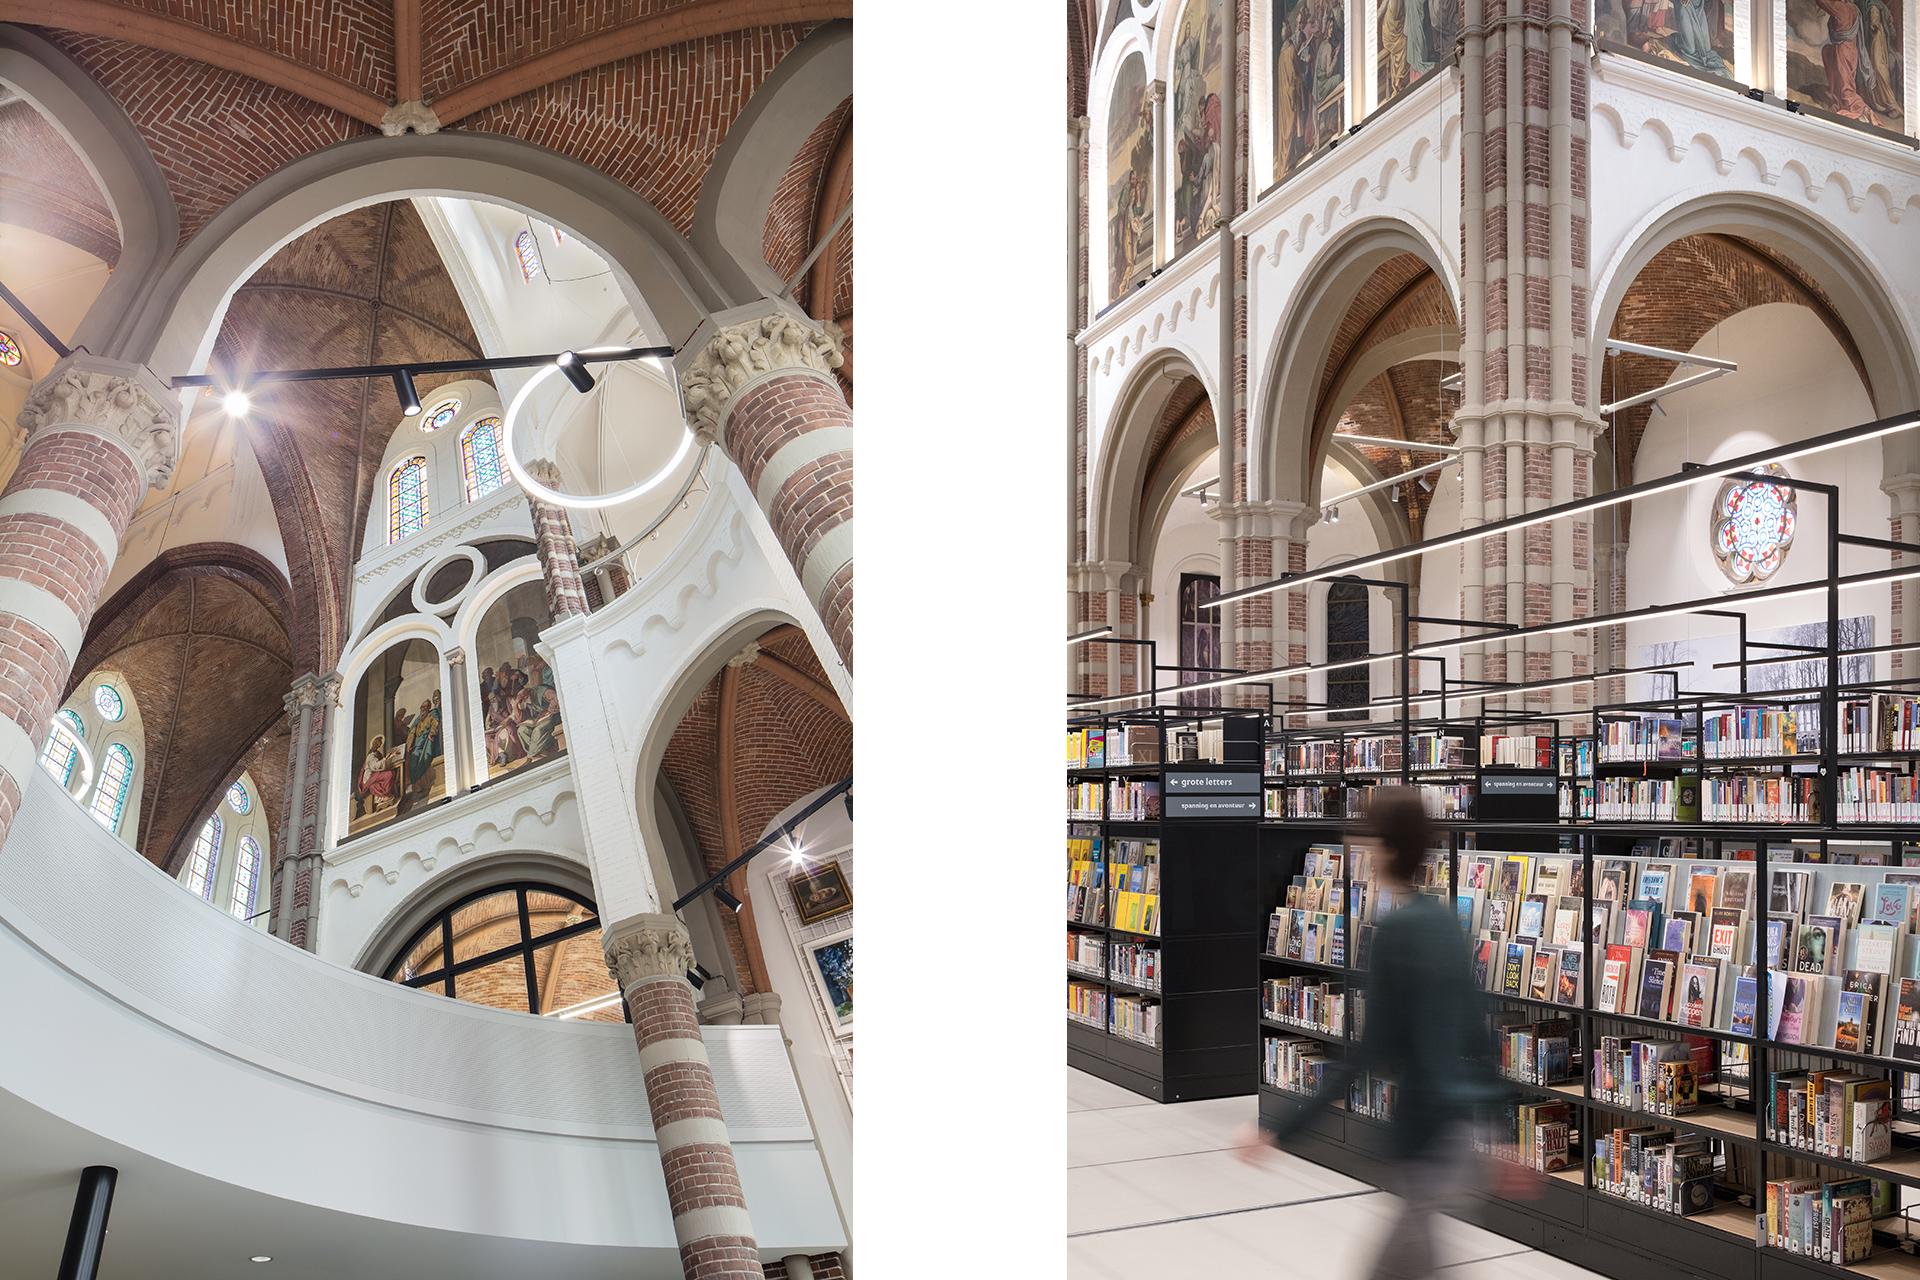 SP2018-Kerk-Bibliotheek-DePetrus-6-HiRes